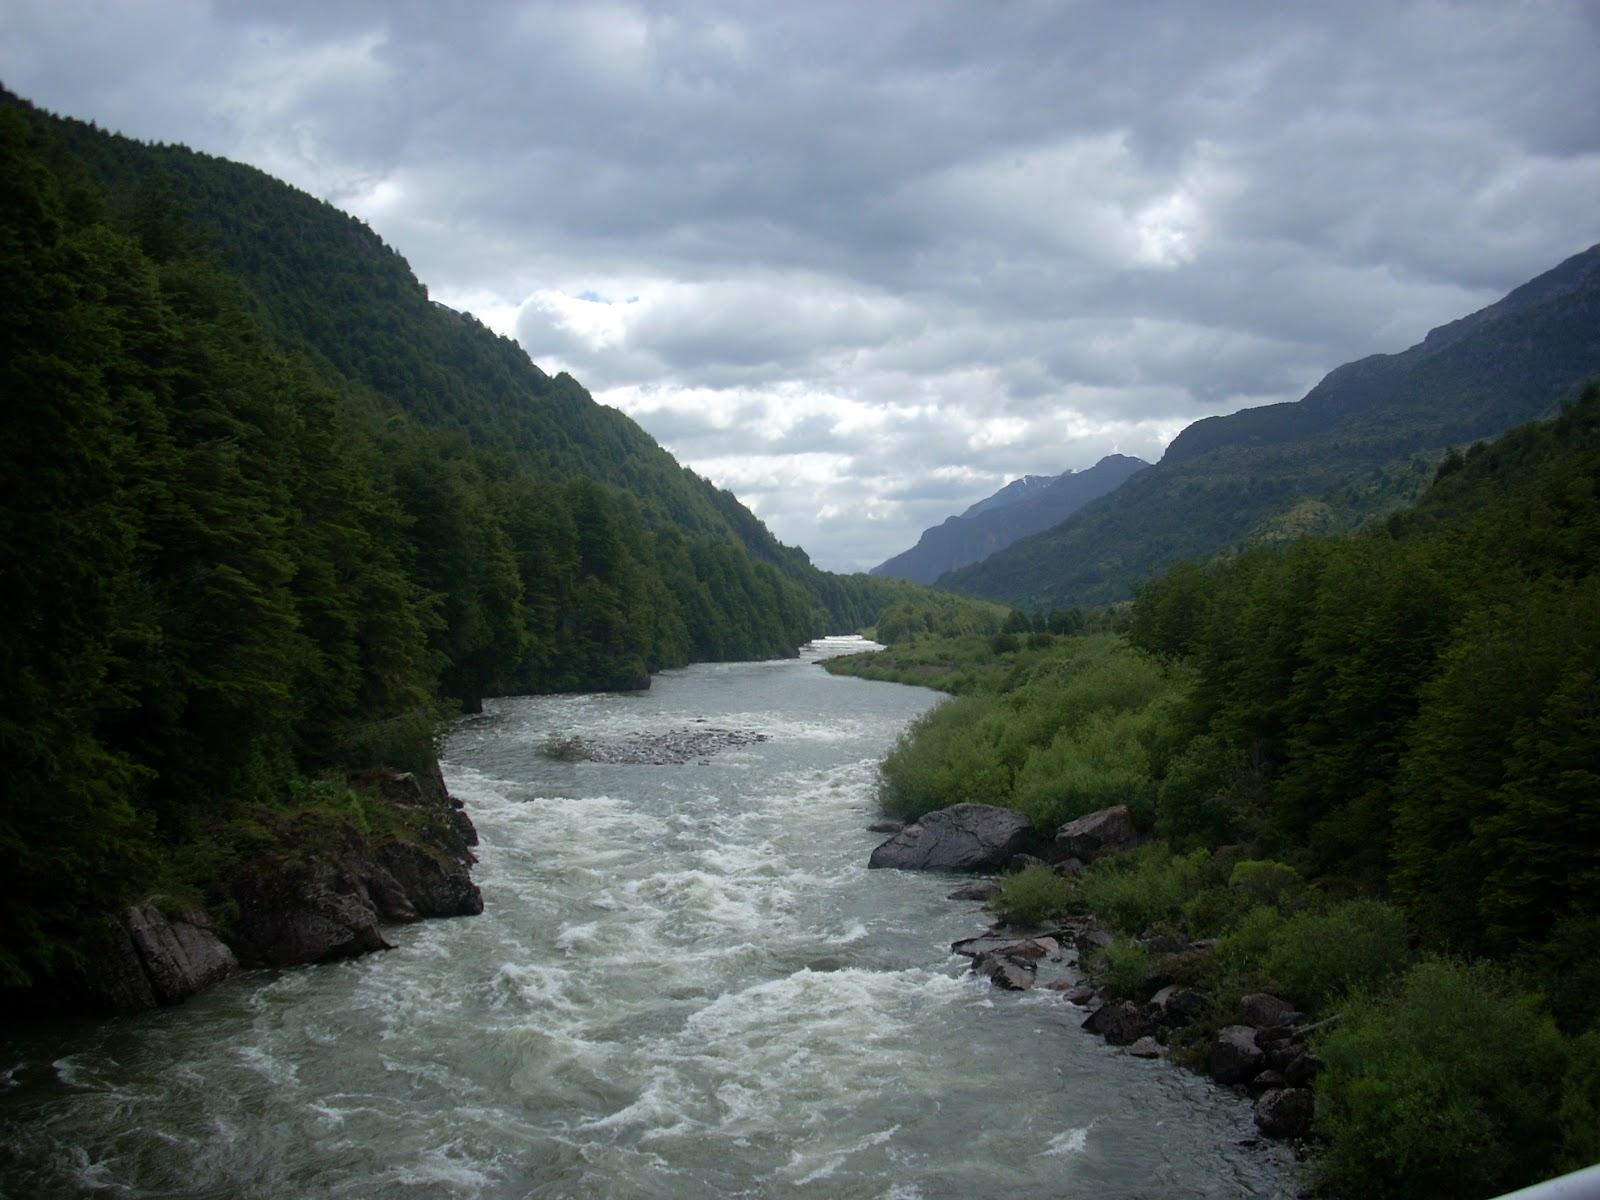 Rio Manihuales